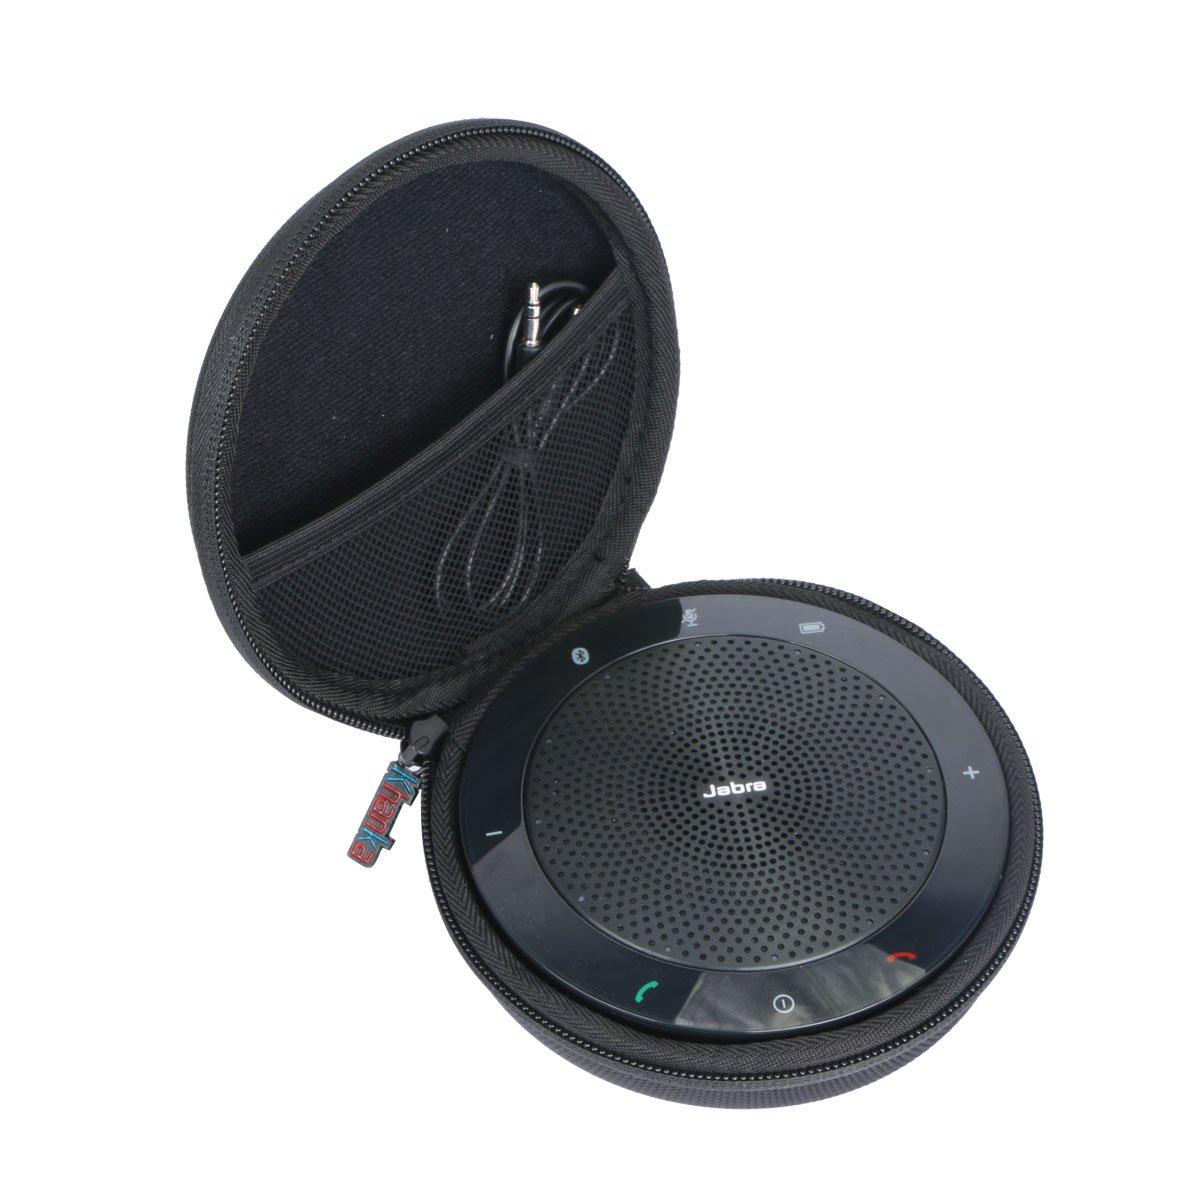 Hard Case for Jabra Speak 510 Wireless Bluetooth Speaker by Khanka